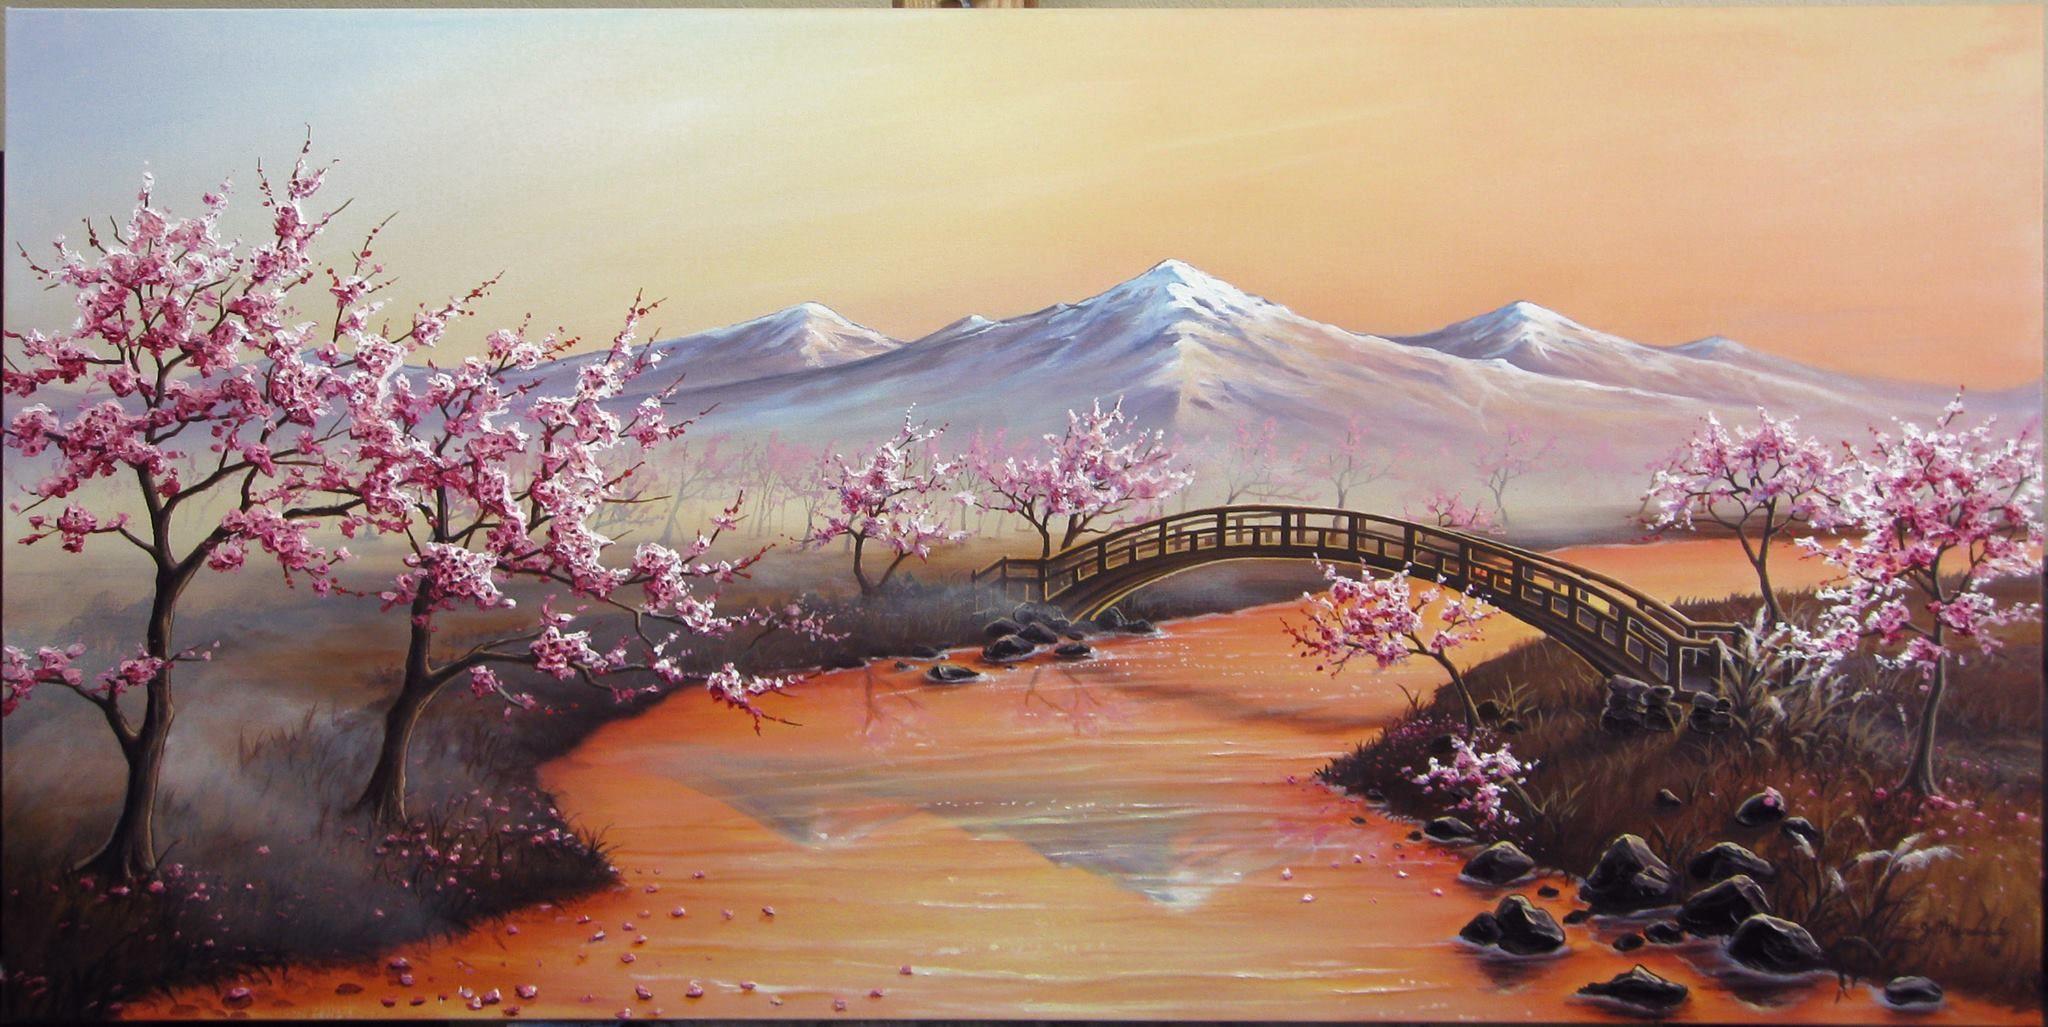 Photo Nature Plant Tree Cherry Blossom Sunshine Giant Wall Art Poster Print